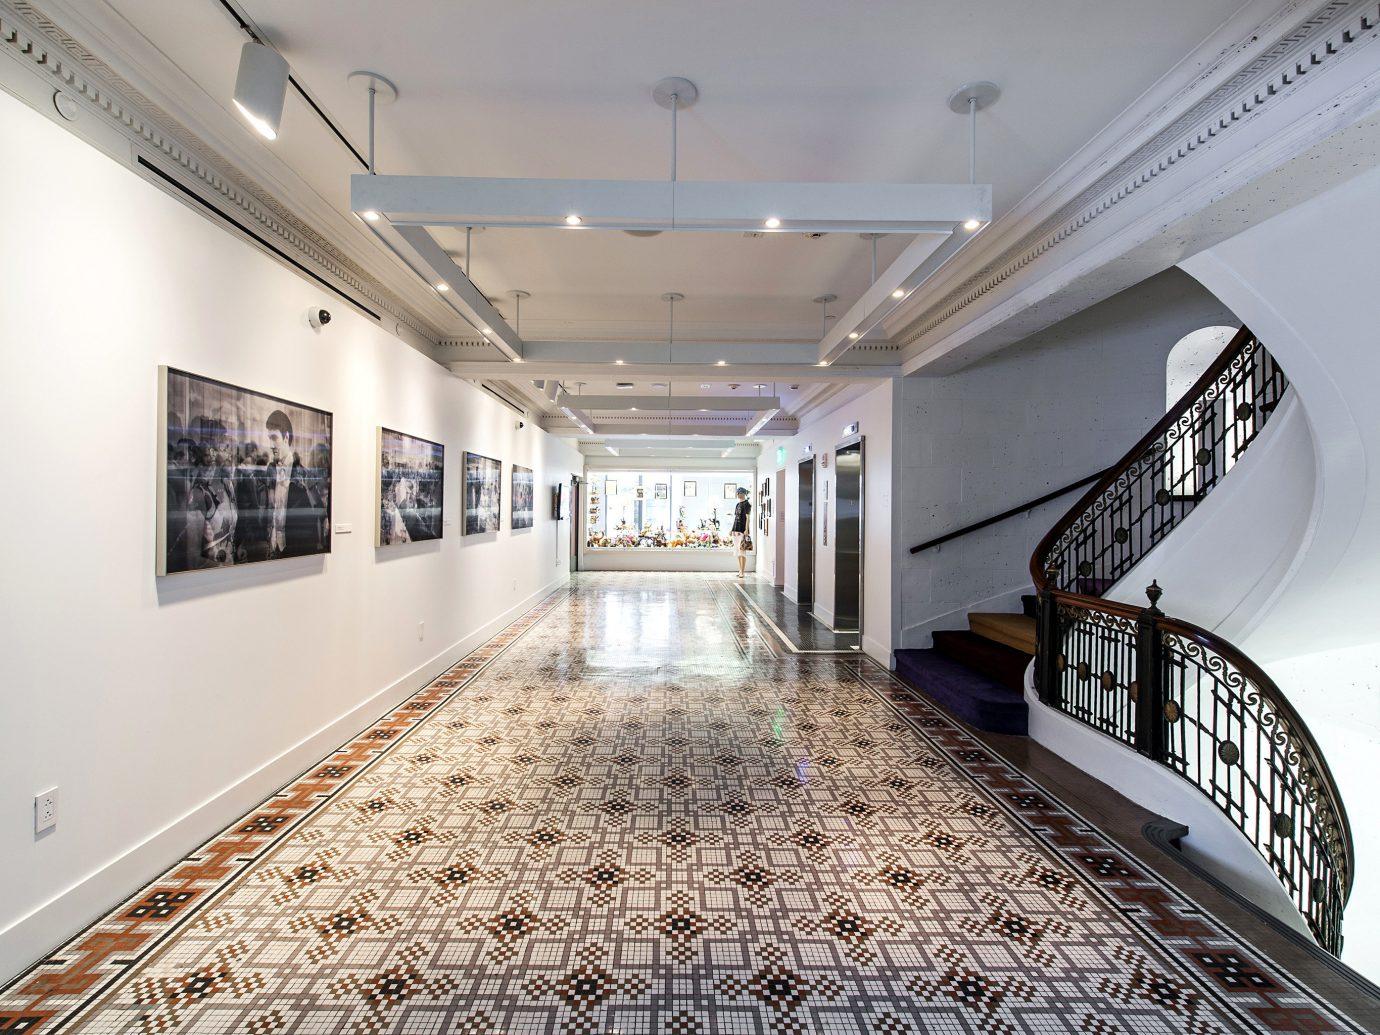 21c Museum Hotel Cincinnati art gallery